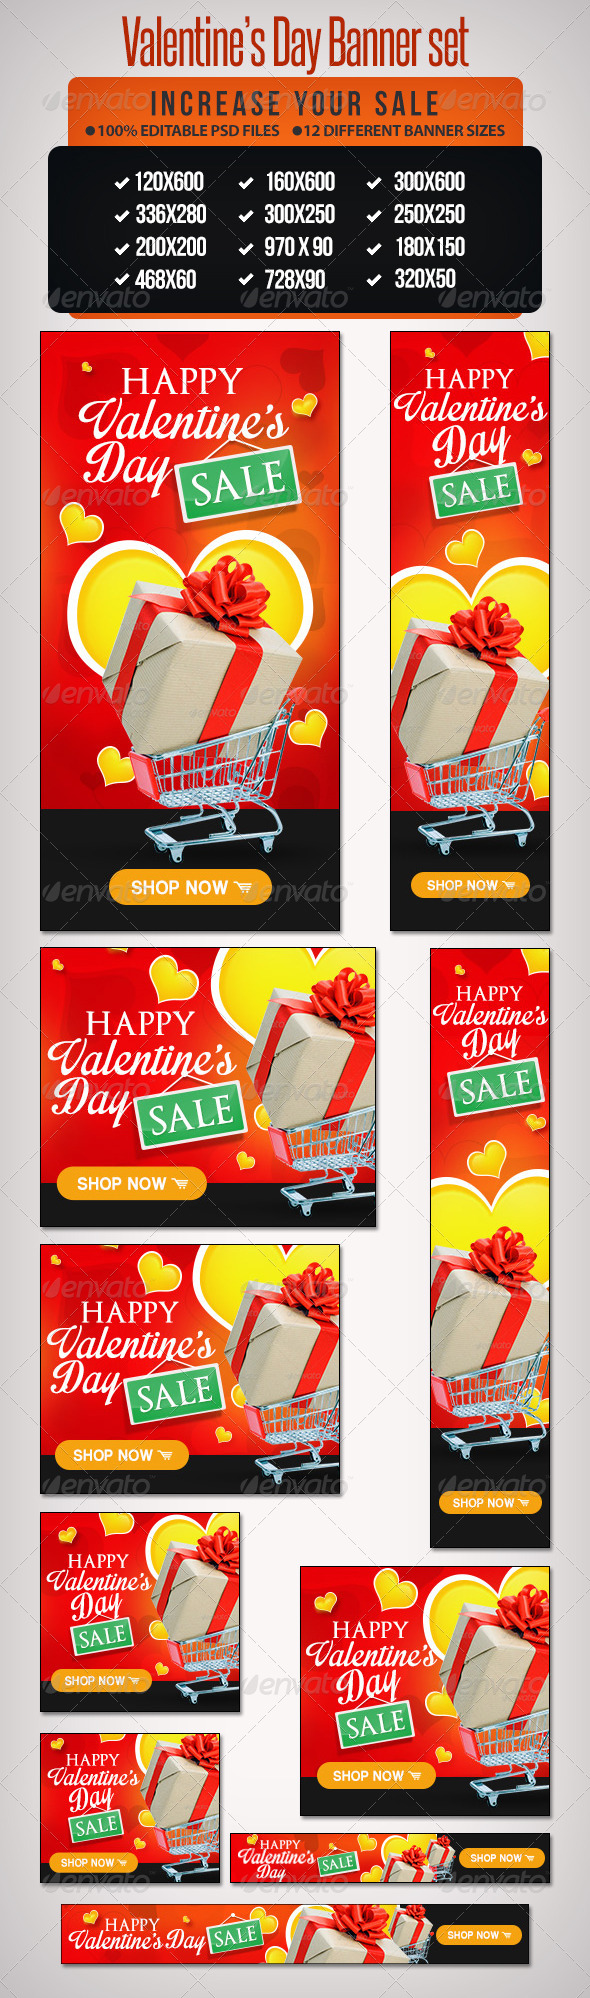 GraphicRiver Valentine s Day Sale Banner Set- 12 Google Sizes 6522822